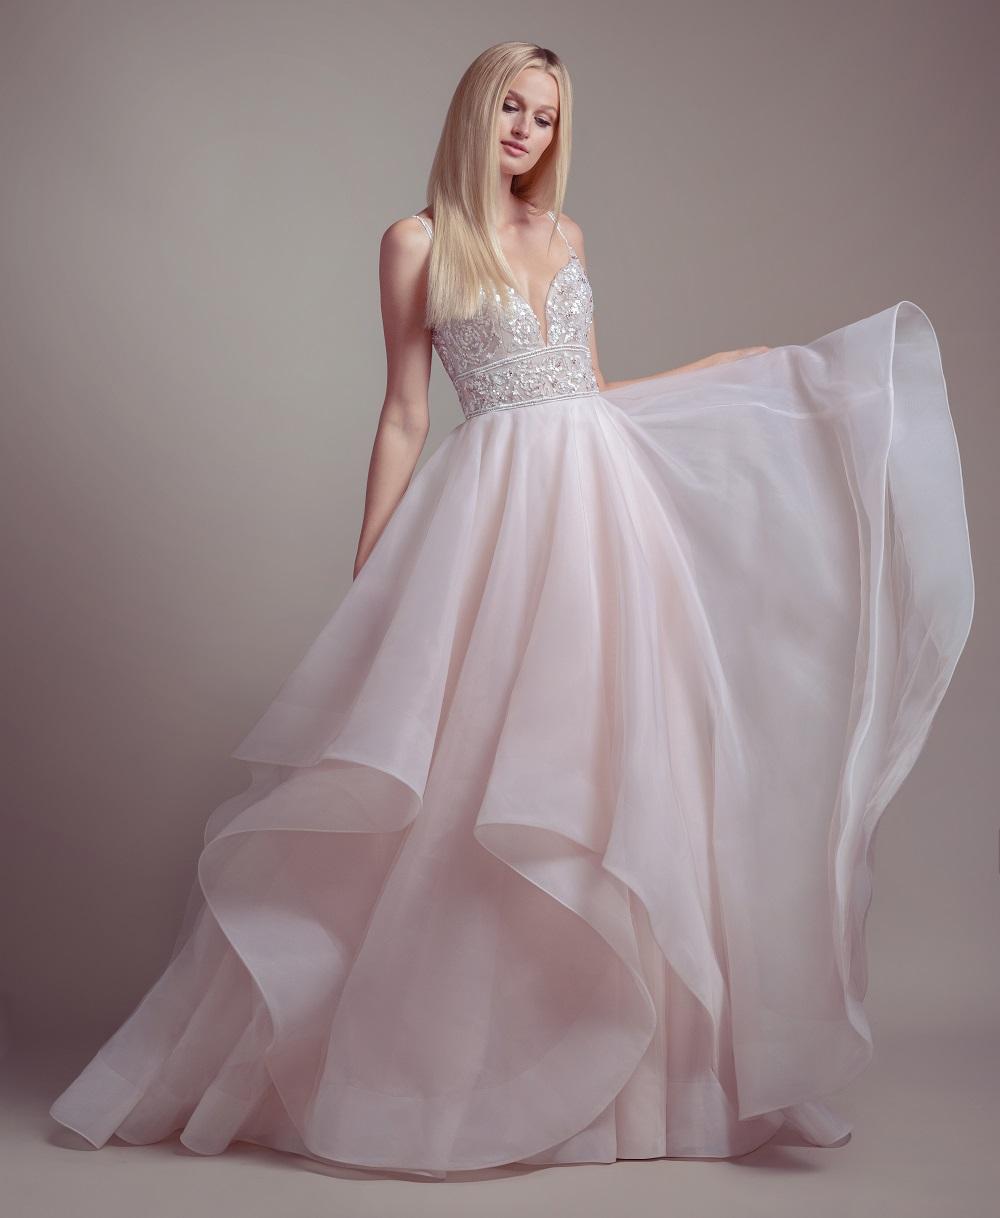 blush-hayley-paige-bridal-spring-2019-style-1912-phoenix_0 (1).jpg